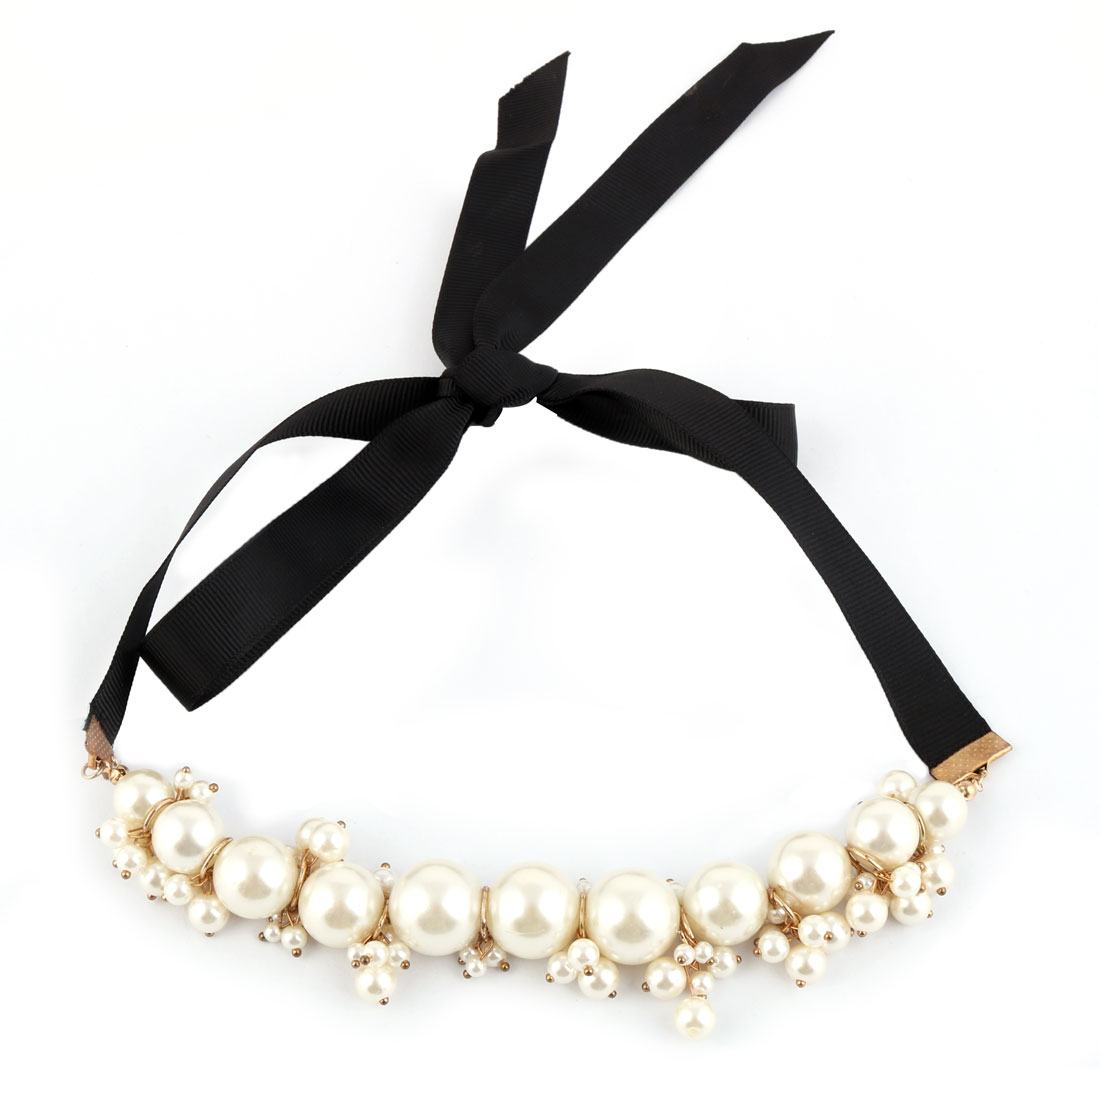 Nylon Ribbon Faux Imitation Pearl Cluster Decorative Choker Necklace Collar Decor